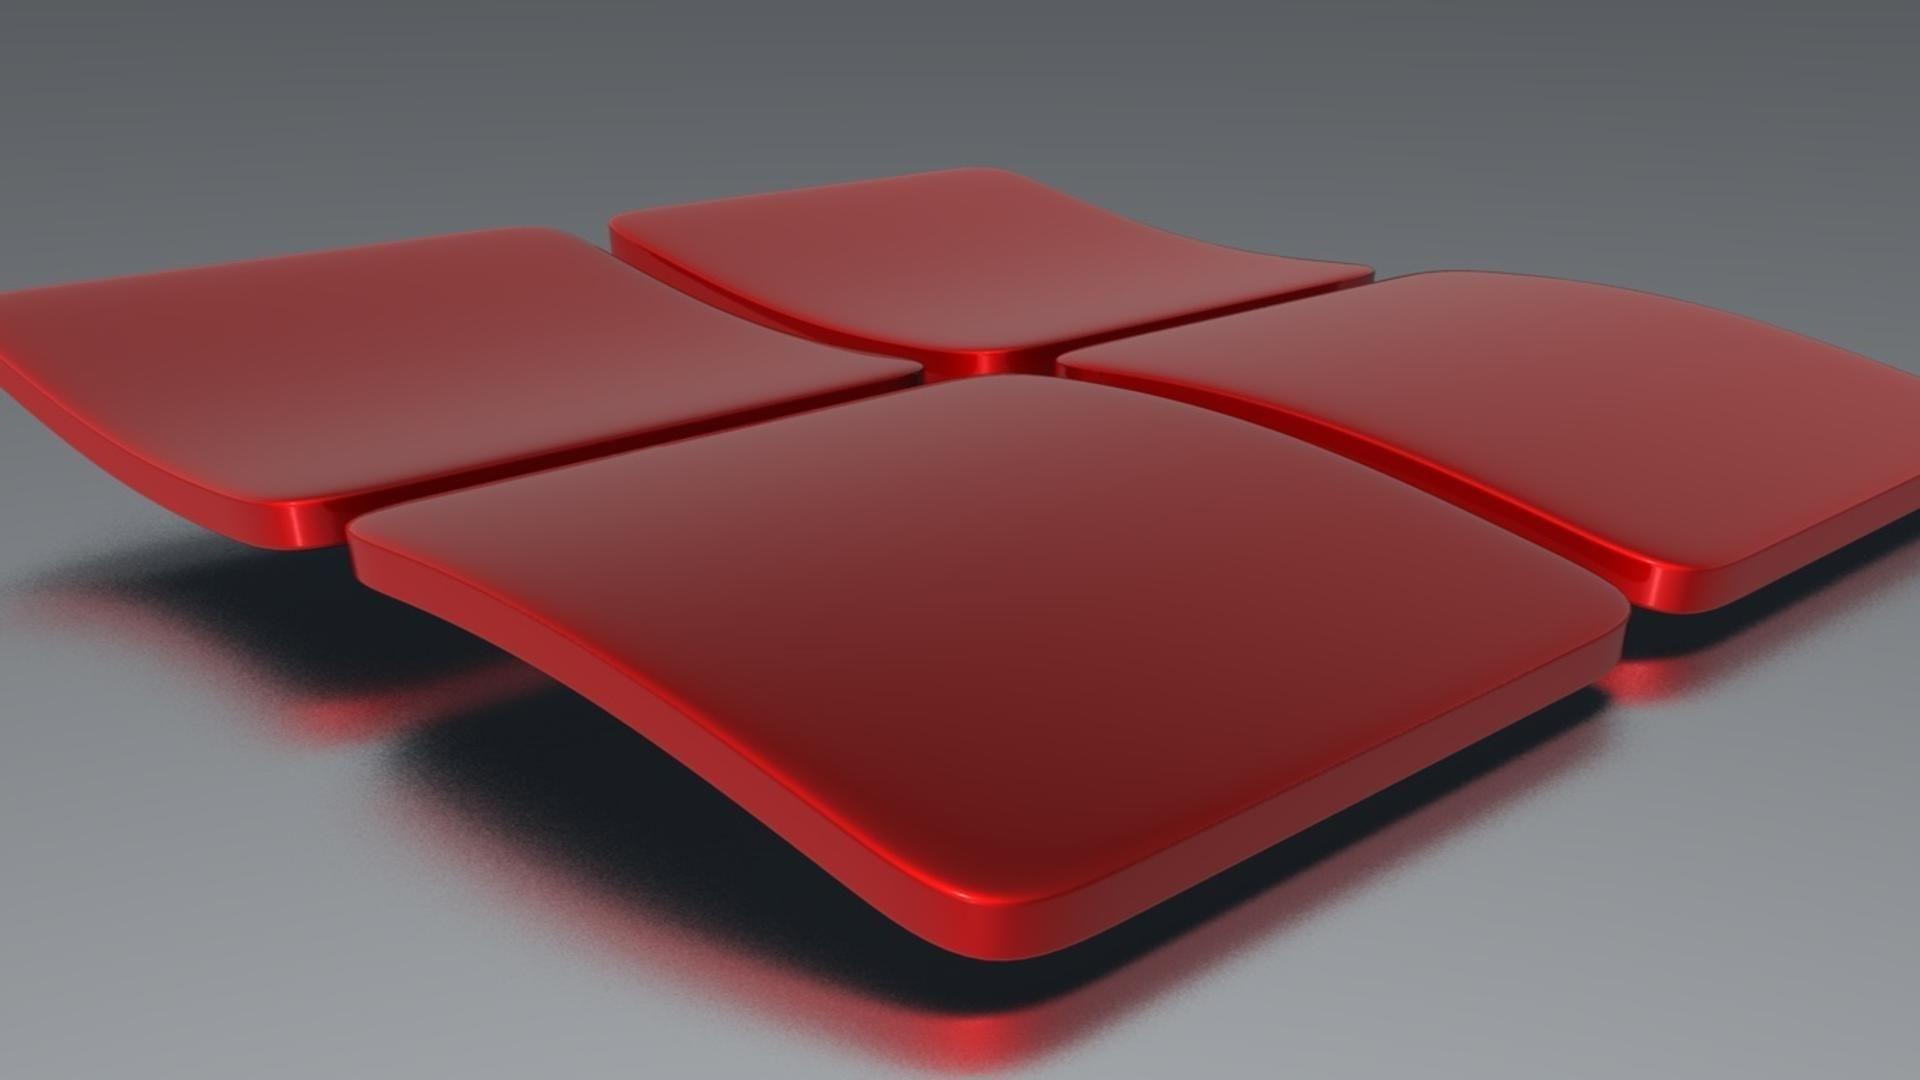 3d Animated Wallpaper For Pc Desktop Free Download Windows 7 Laptop Hd Wallpapers For Windows 10 Pixelstalk Net